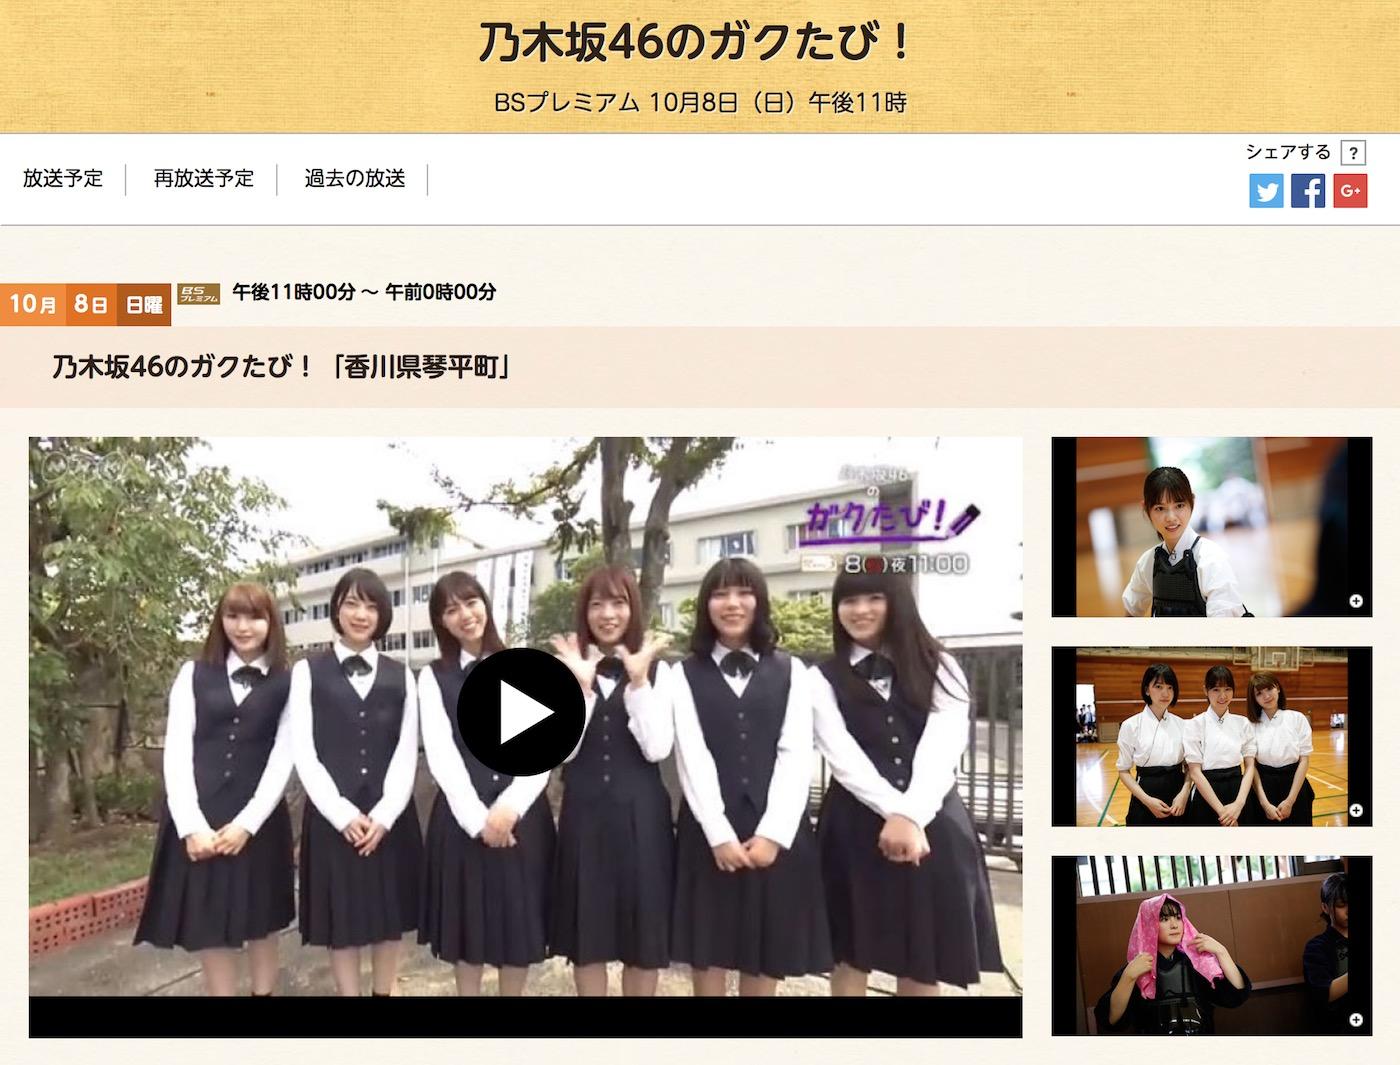 NHK「乃木坂46のガクたび!」第3弾(「香川県琴平町」)